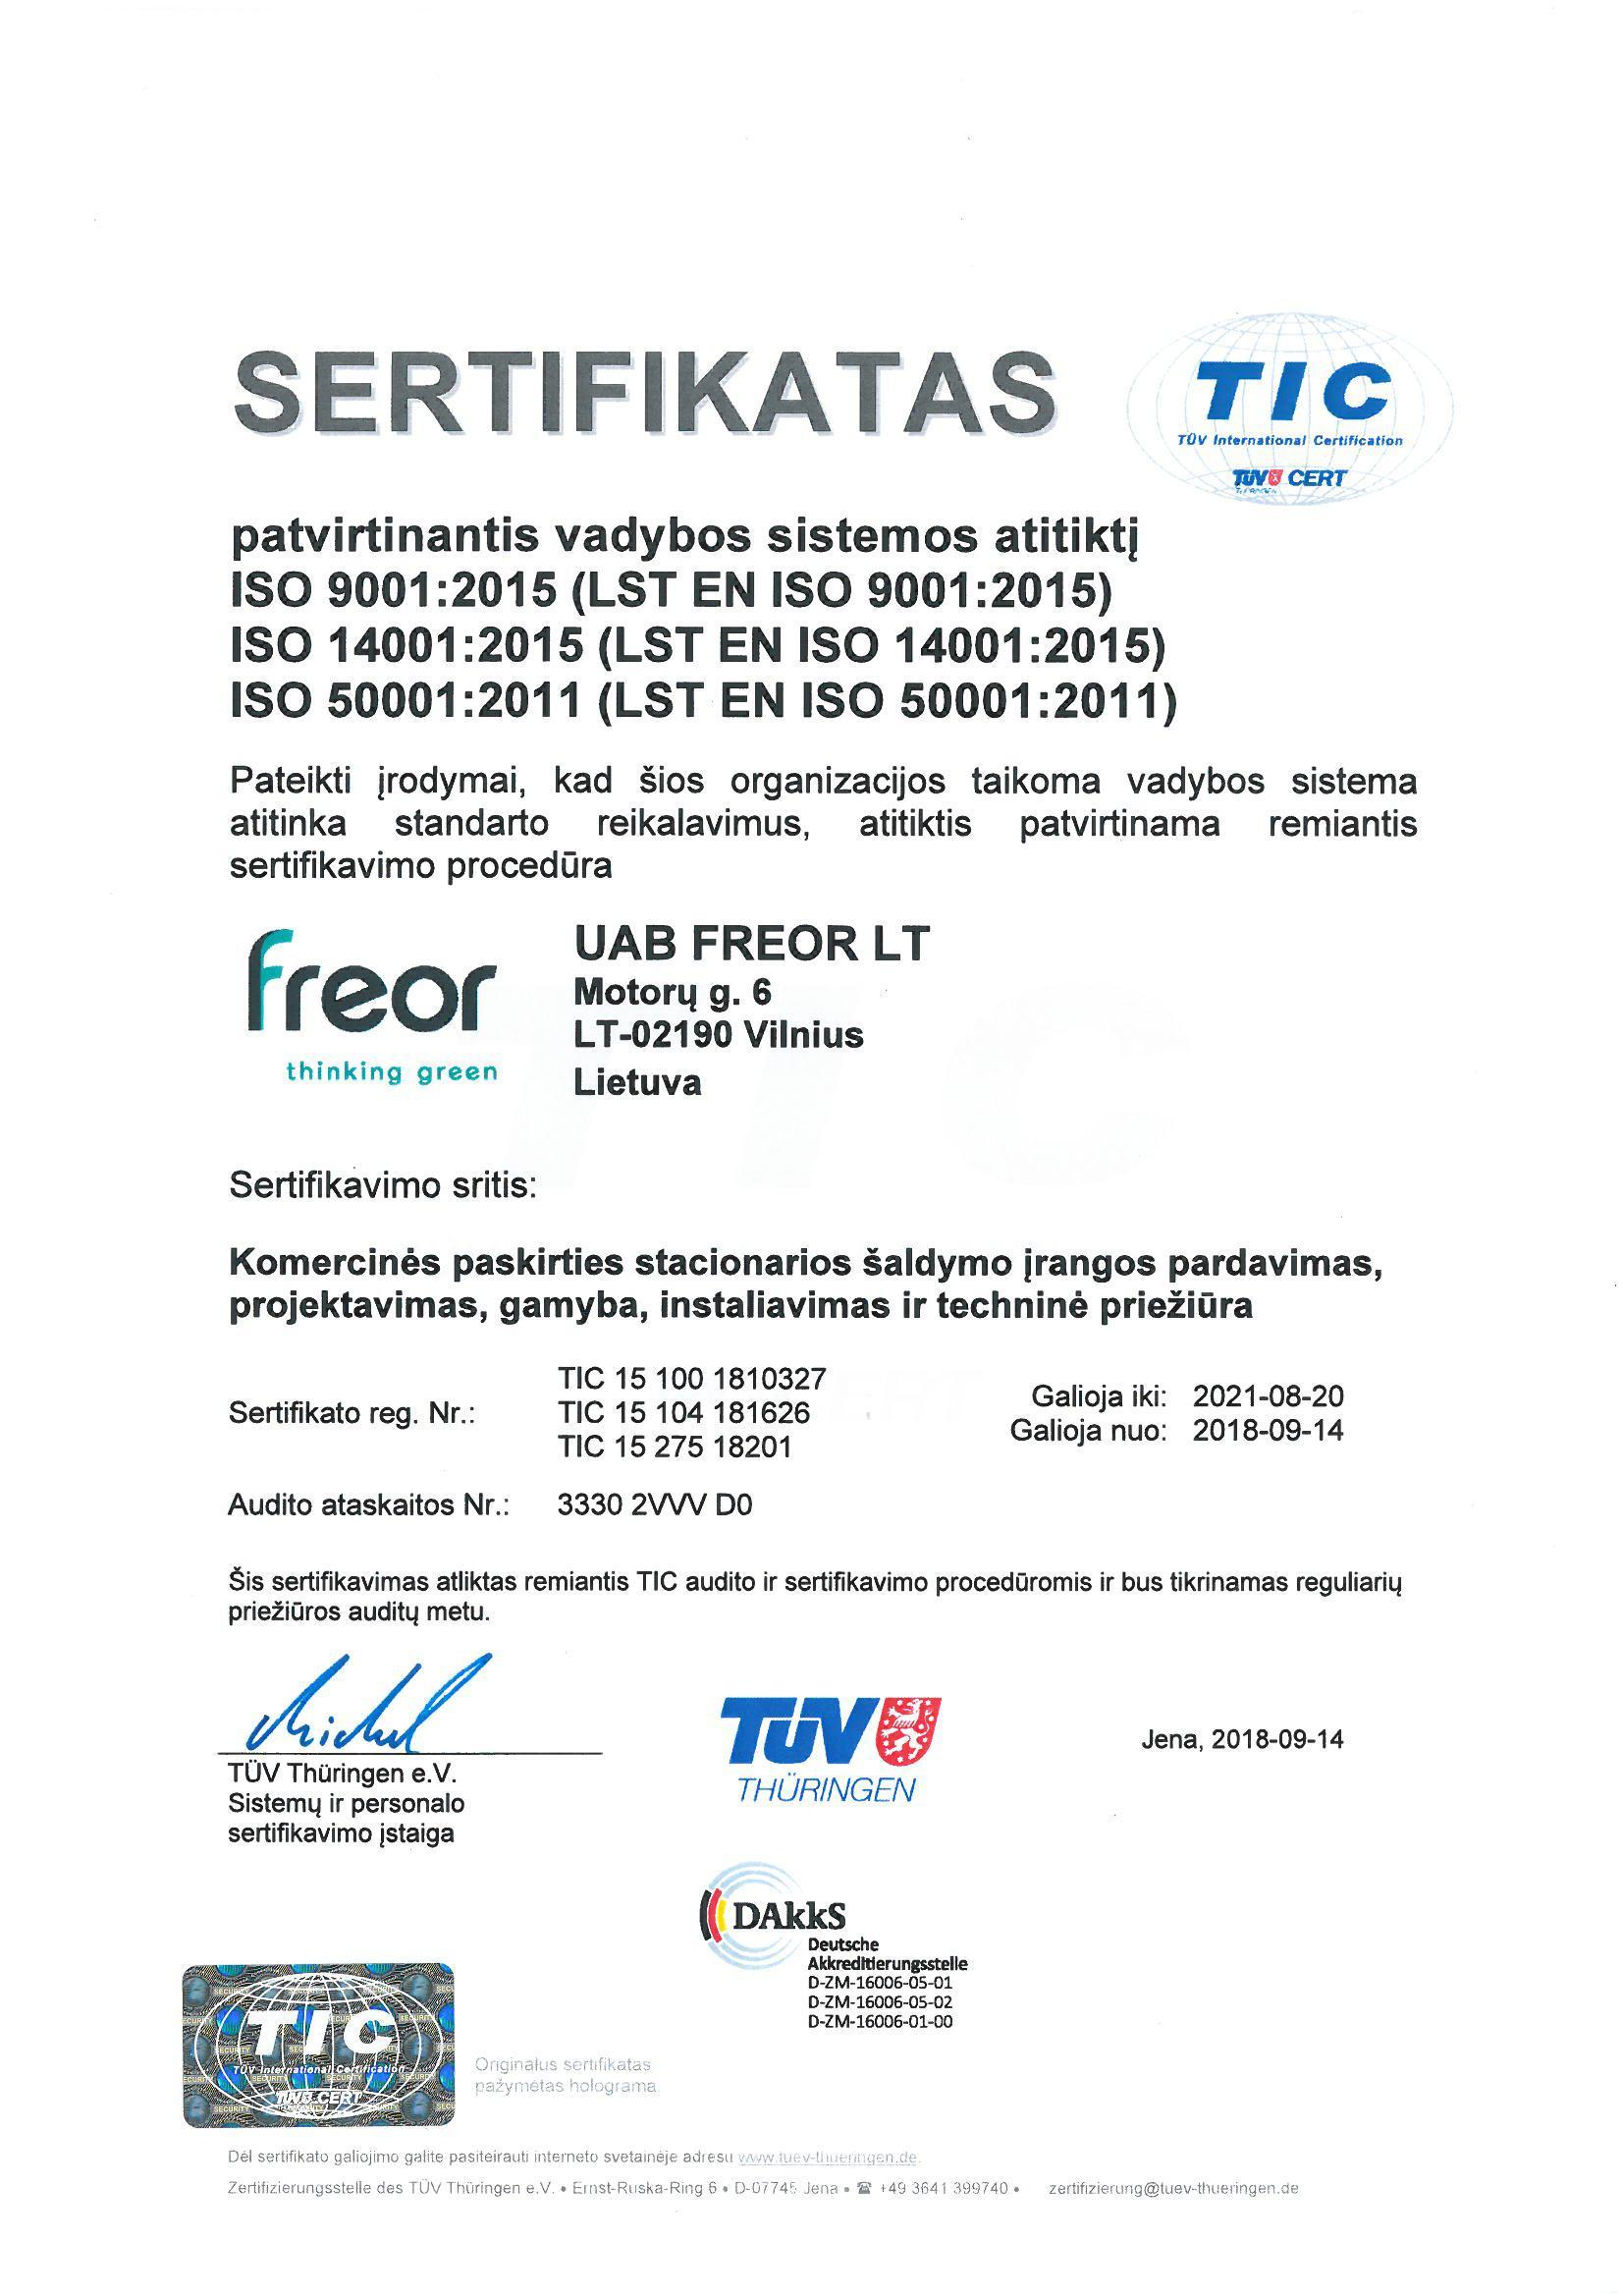 FREOR-sertifikatas-ISO-50001-9001-14001